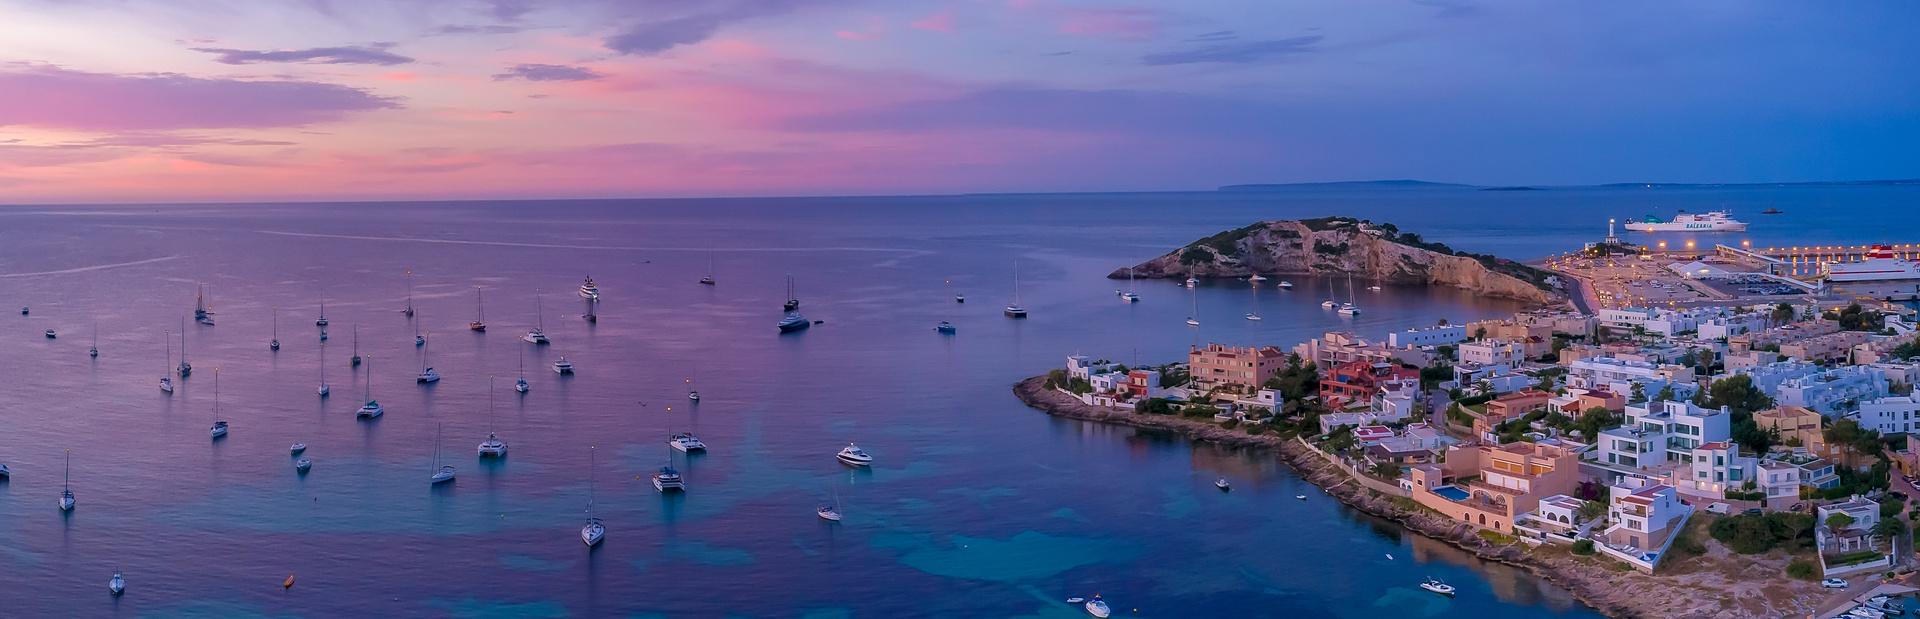 Ibiza news photo